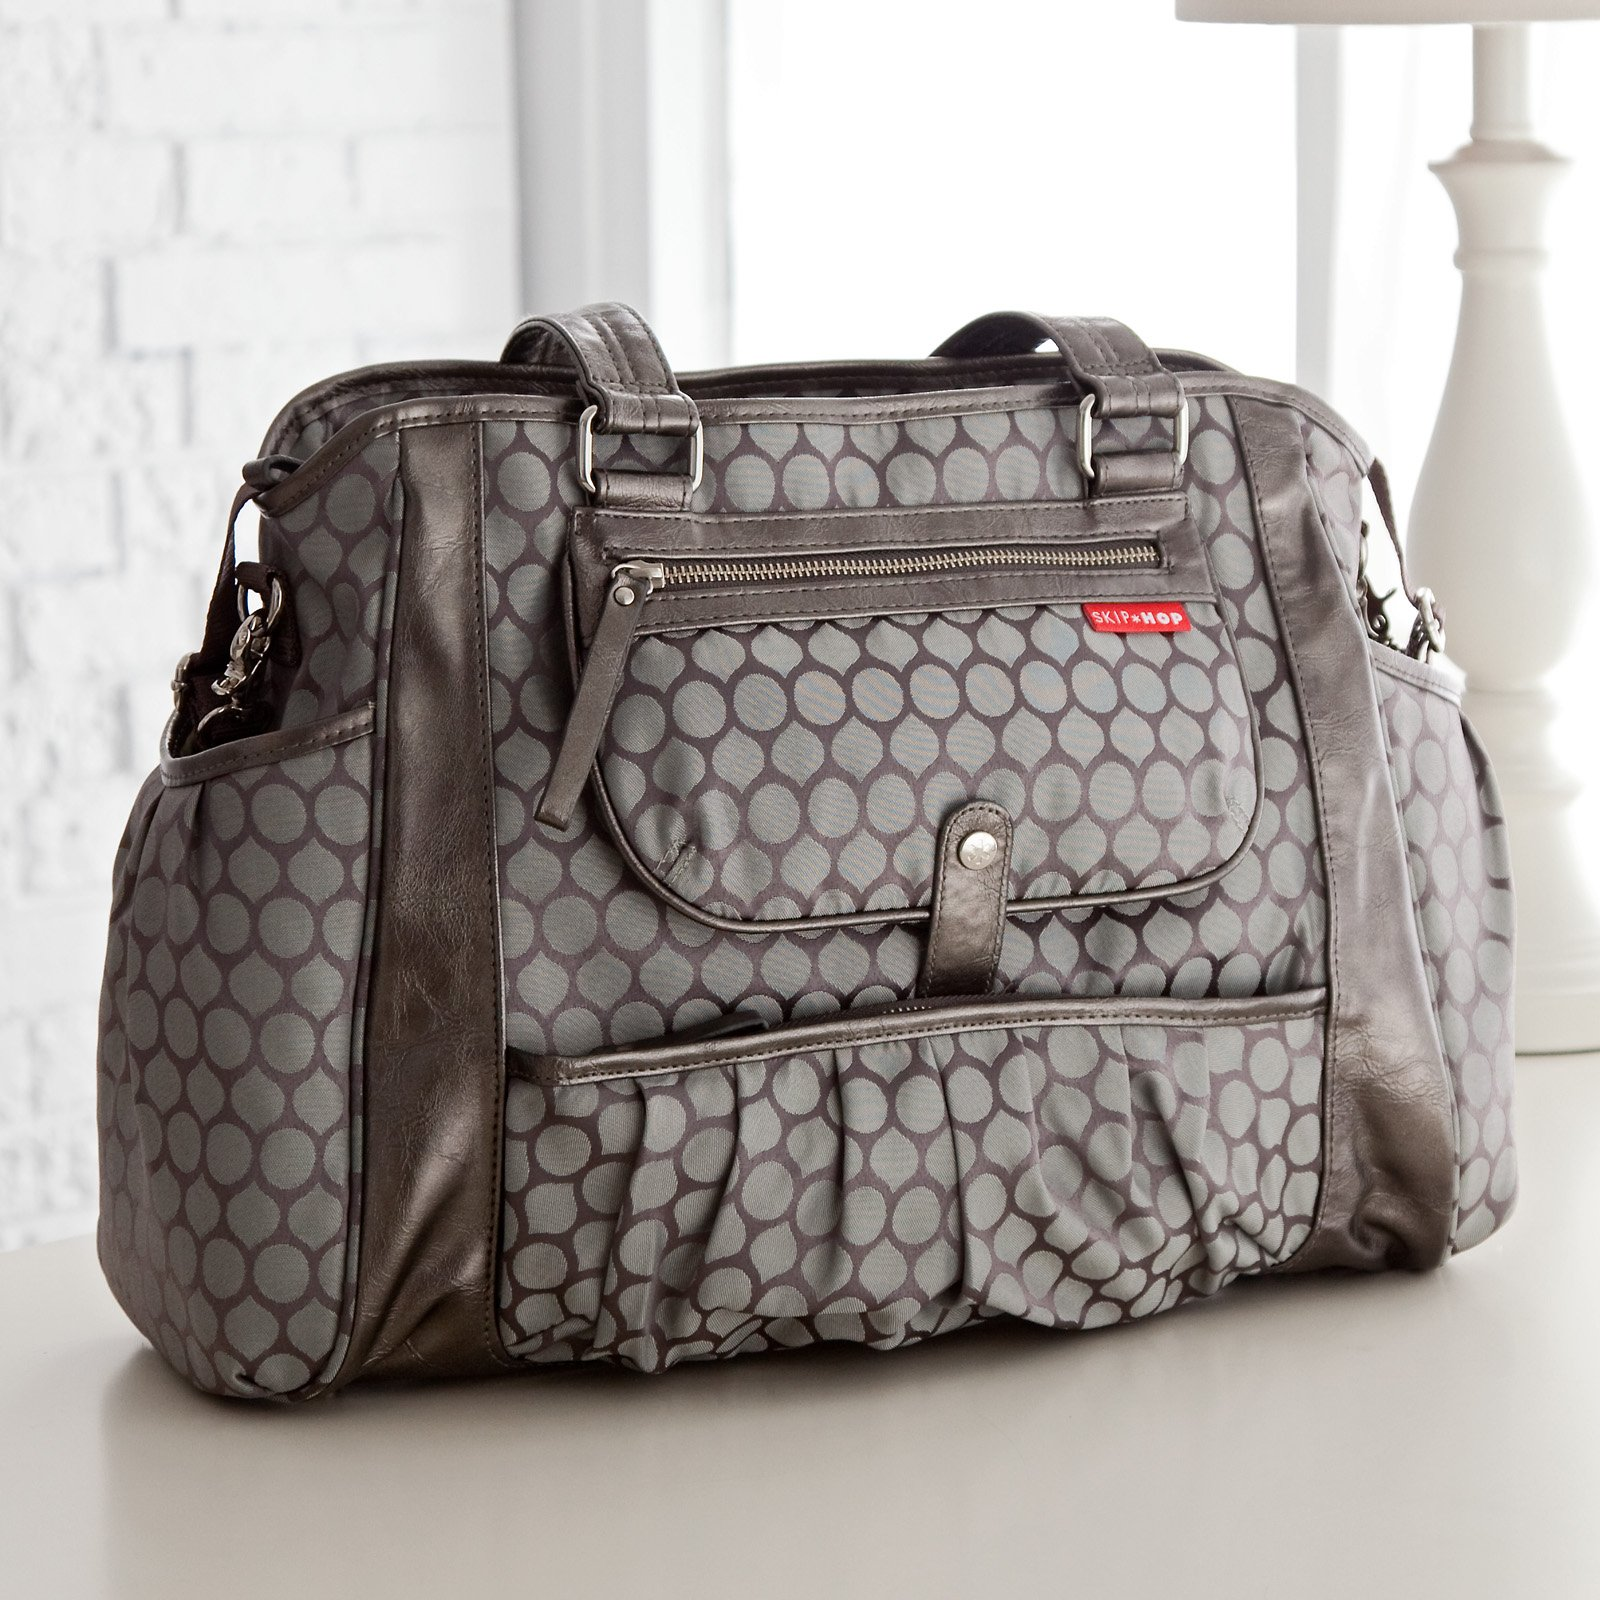 fashion moms need a fashion diaper bag women daily magazine. Black Bedroom Furniture Sets. Home Design Ideas